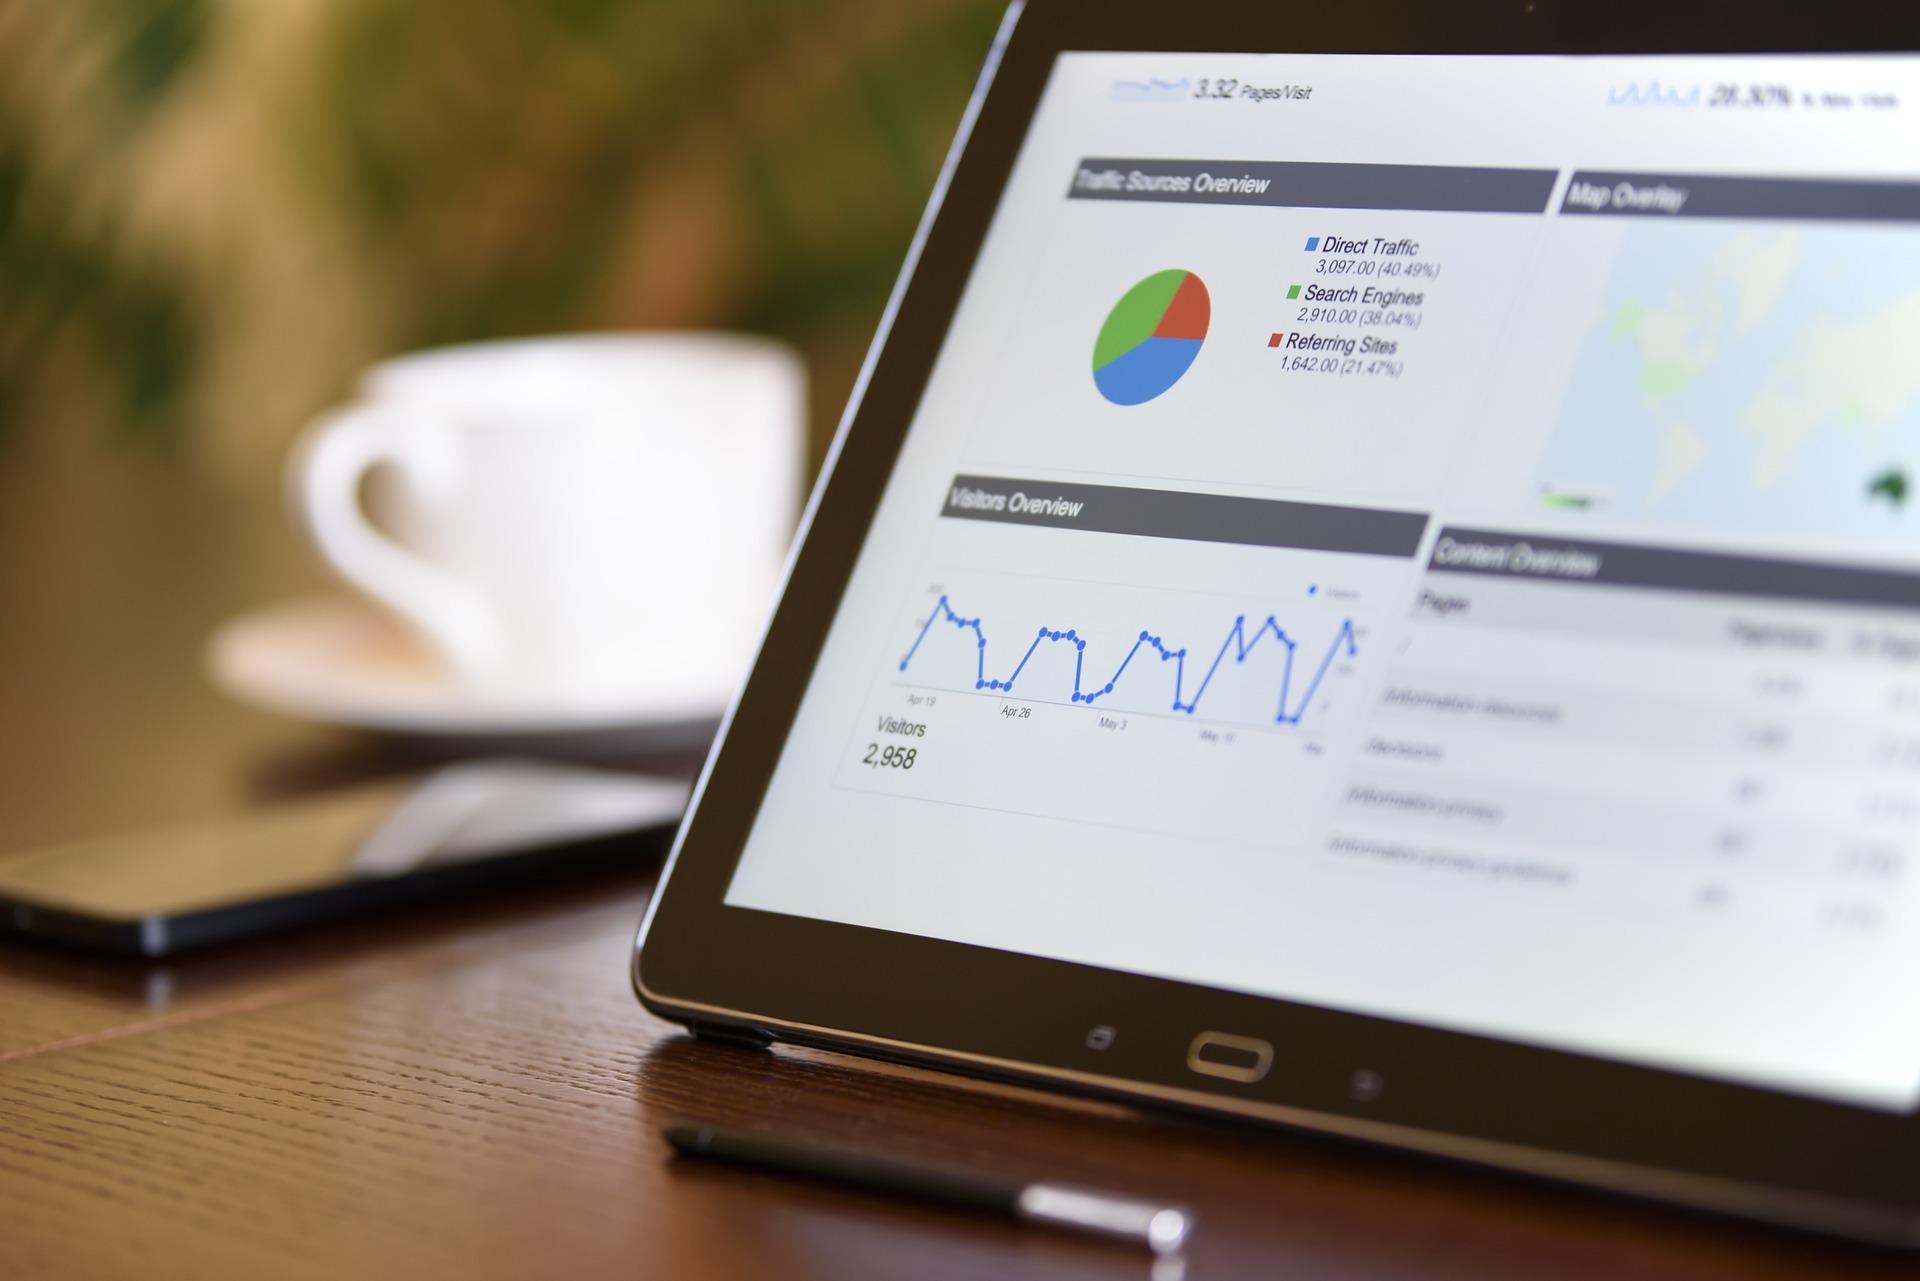 Her er fordelene ved og de forskellige former for markedsføring